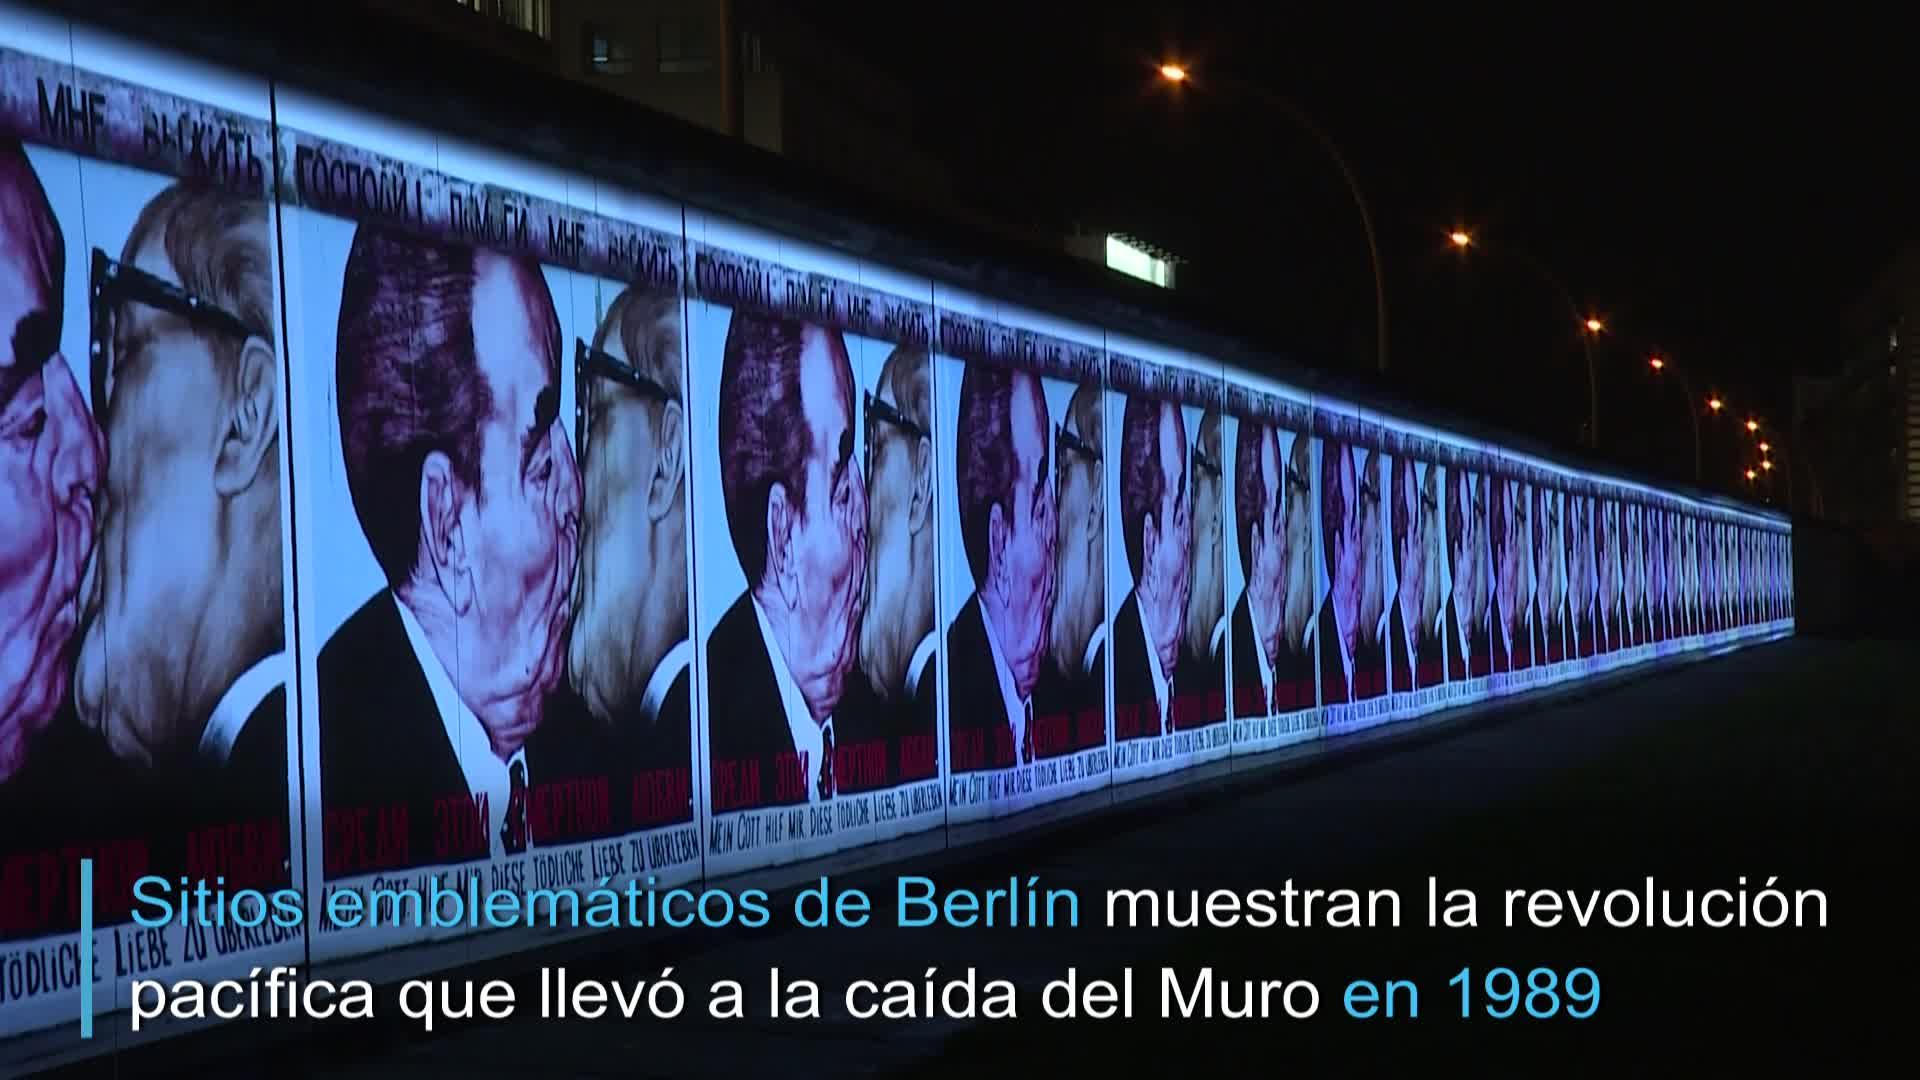 La caída del muro de Berlín se proyecta en paredes de la capital alemana